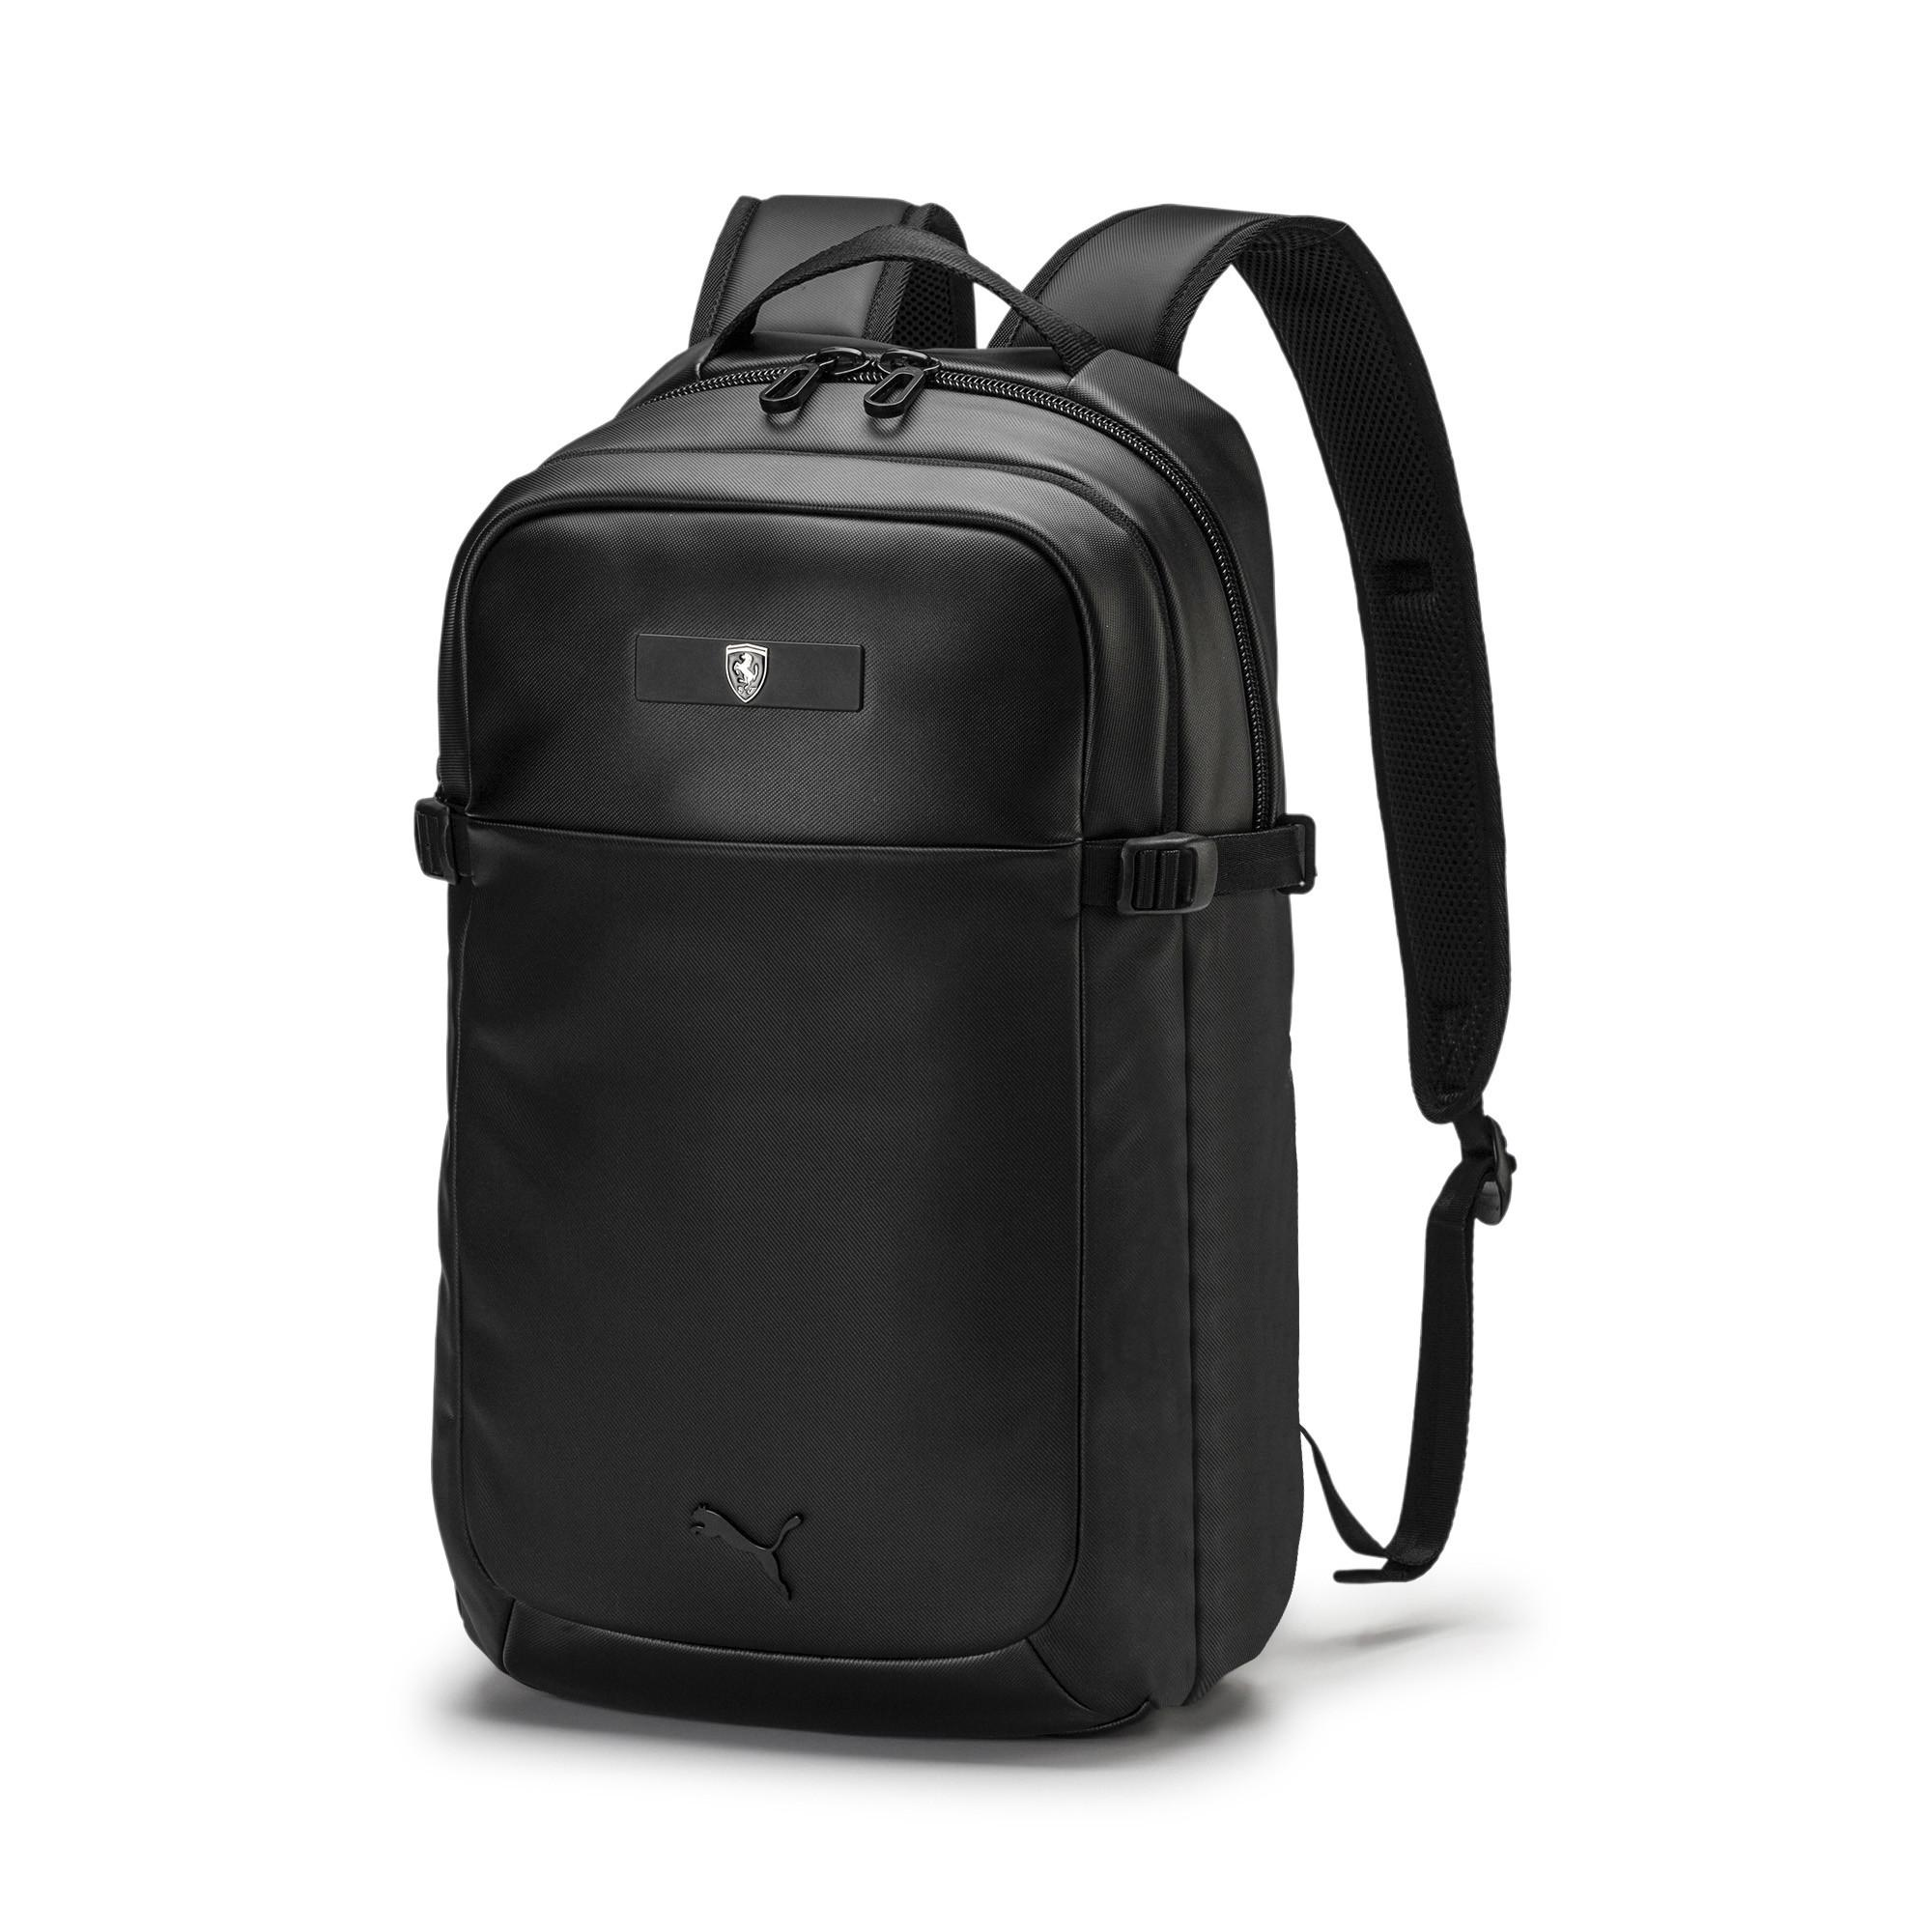 cheap for discount a3a18 7543a Scuderia Ferrari Lifestyle Backpack